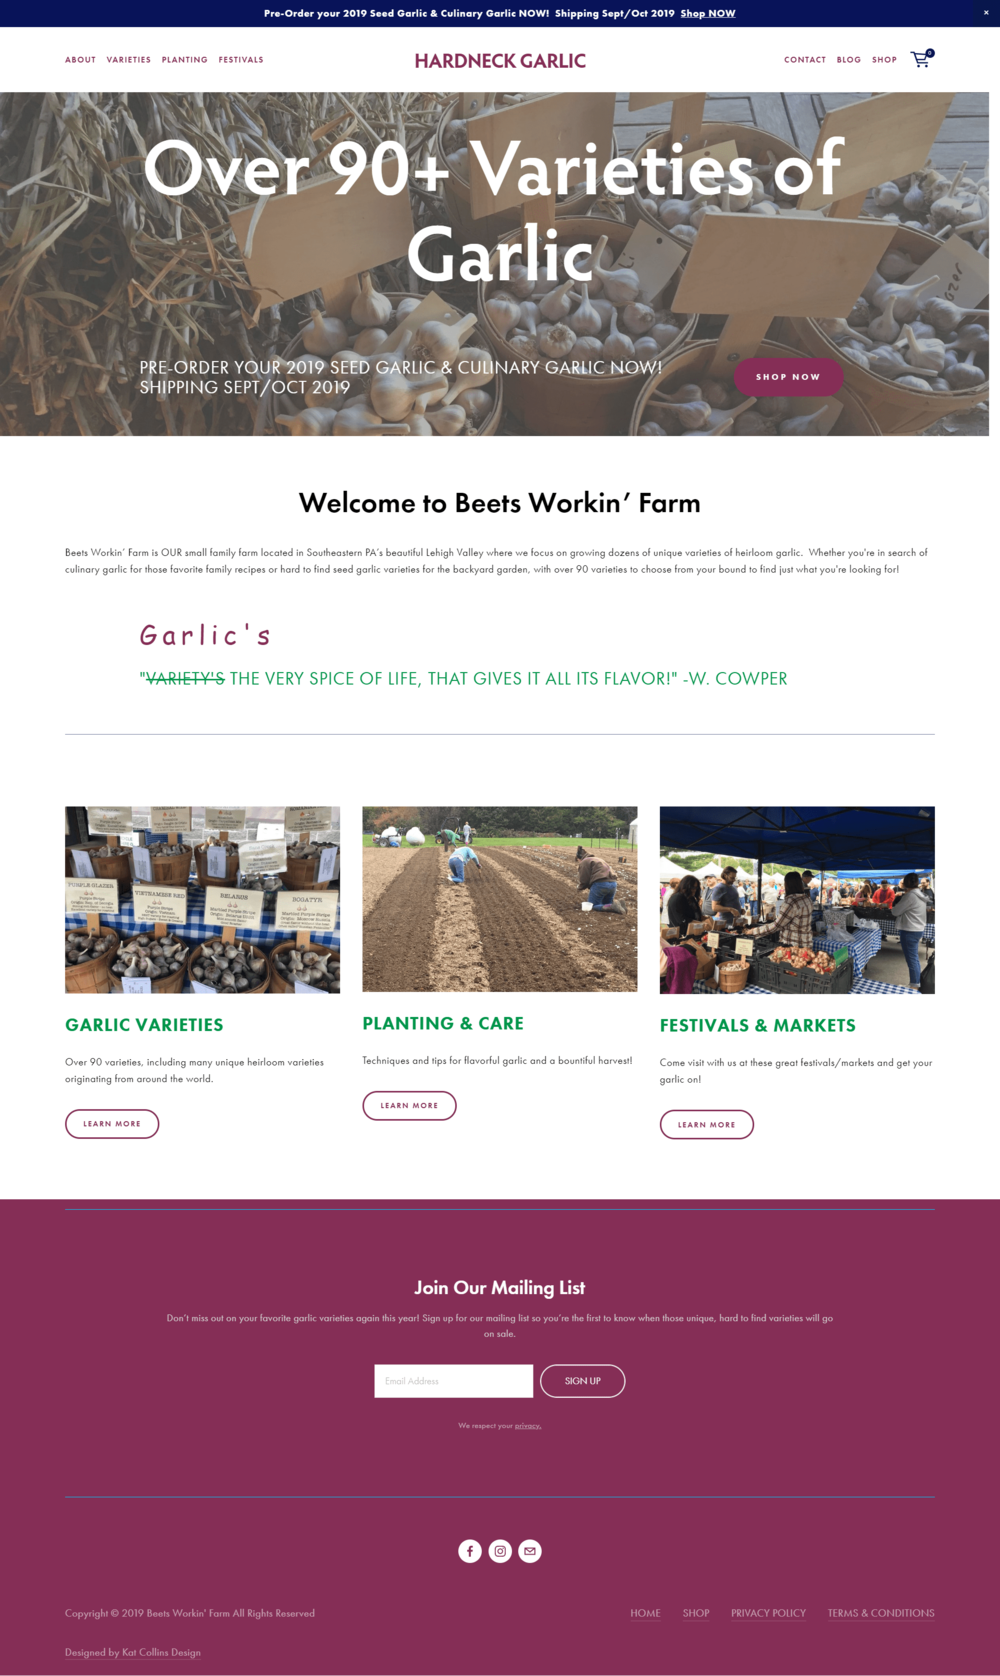 Hardneck Garlic Website Redesign And Ecommerce Portfolio Web Design Website Redesign Portfolio Design